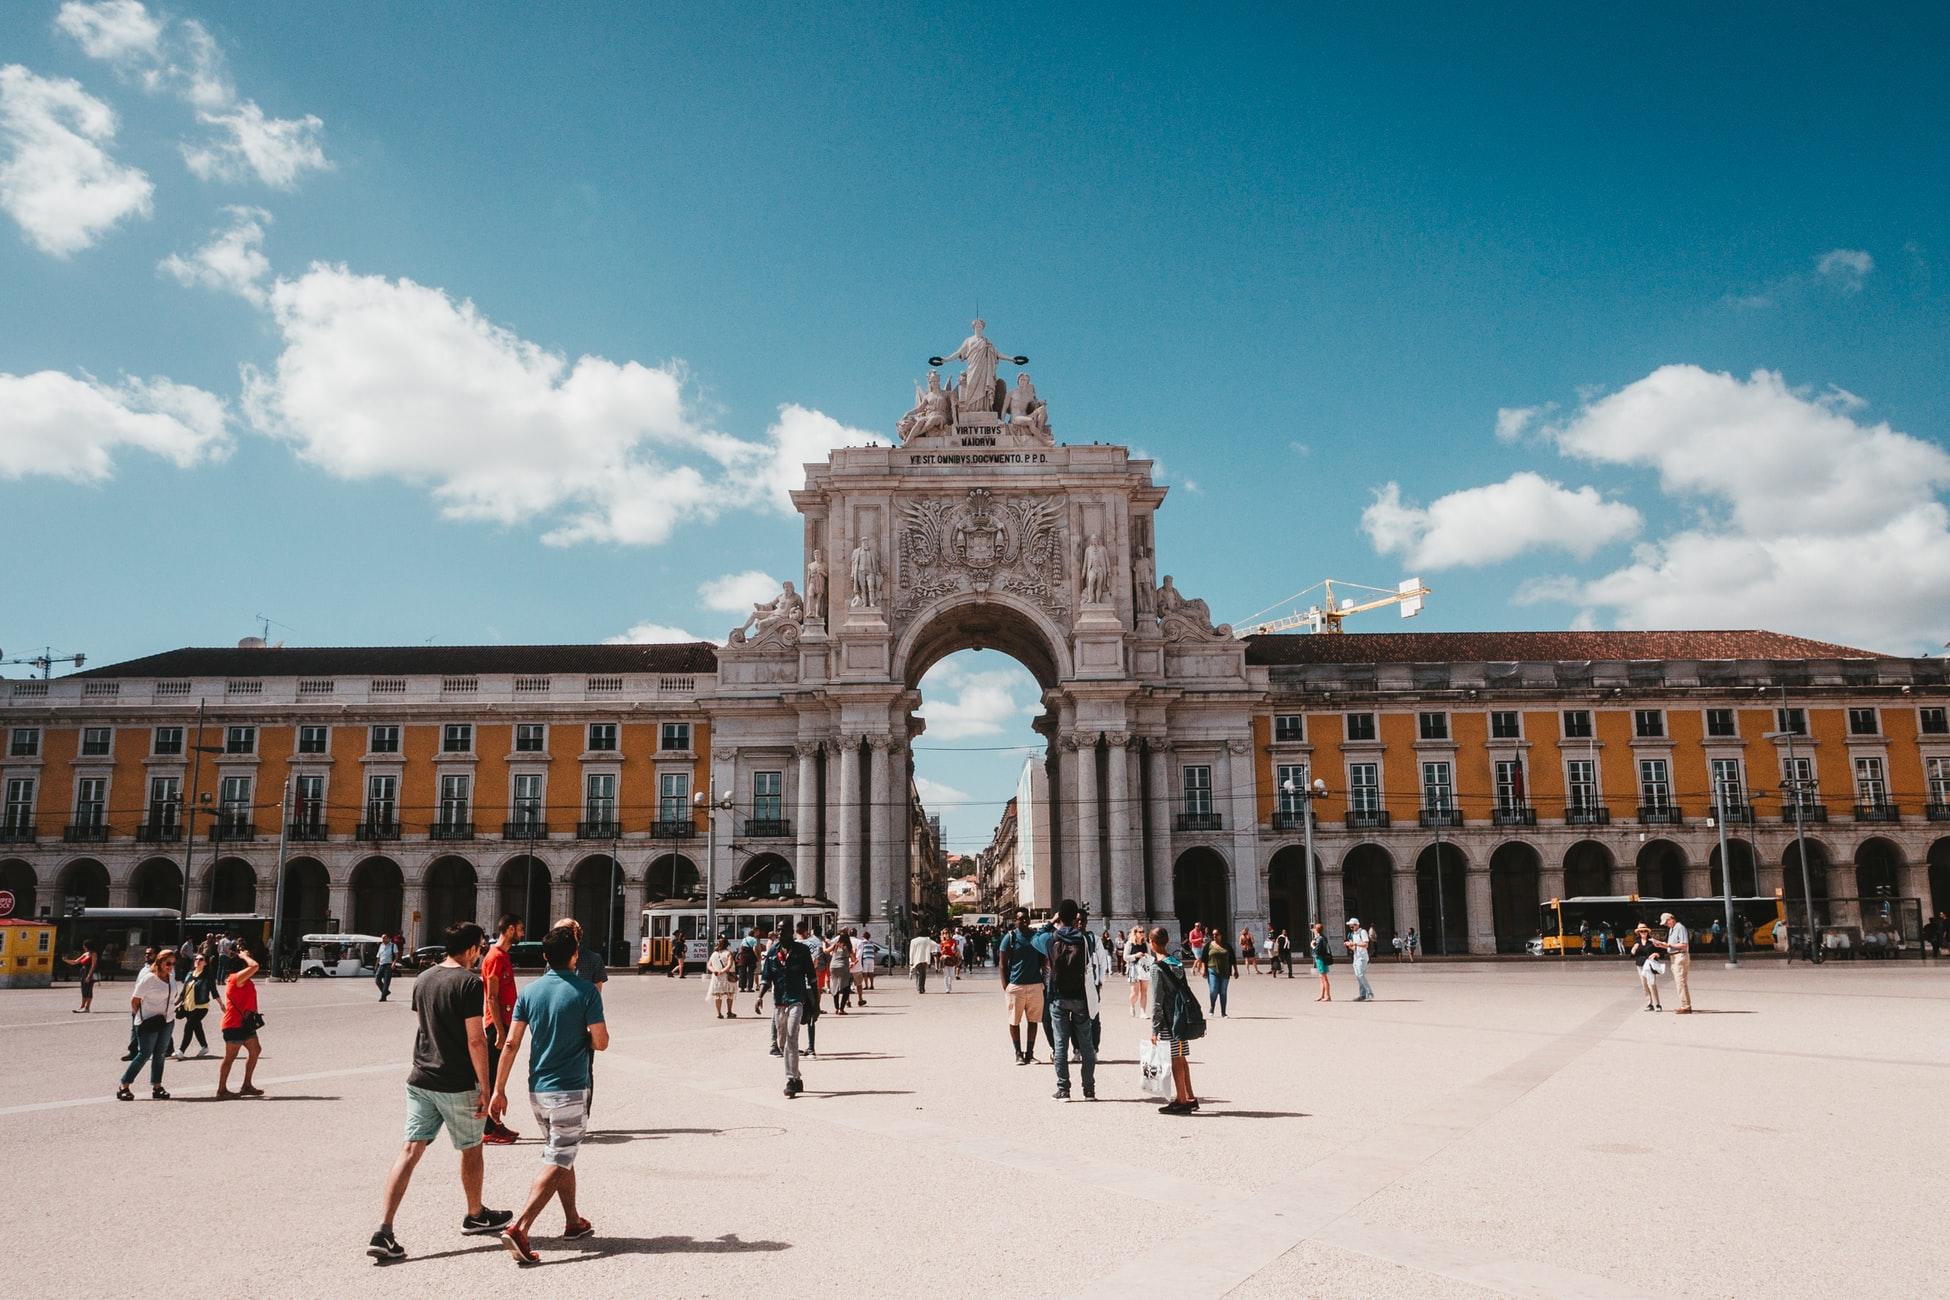 The International EURODEFENSE meeting took place in Lisbon